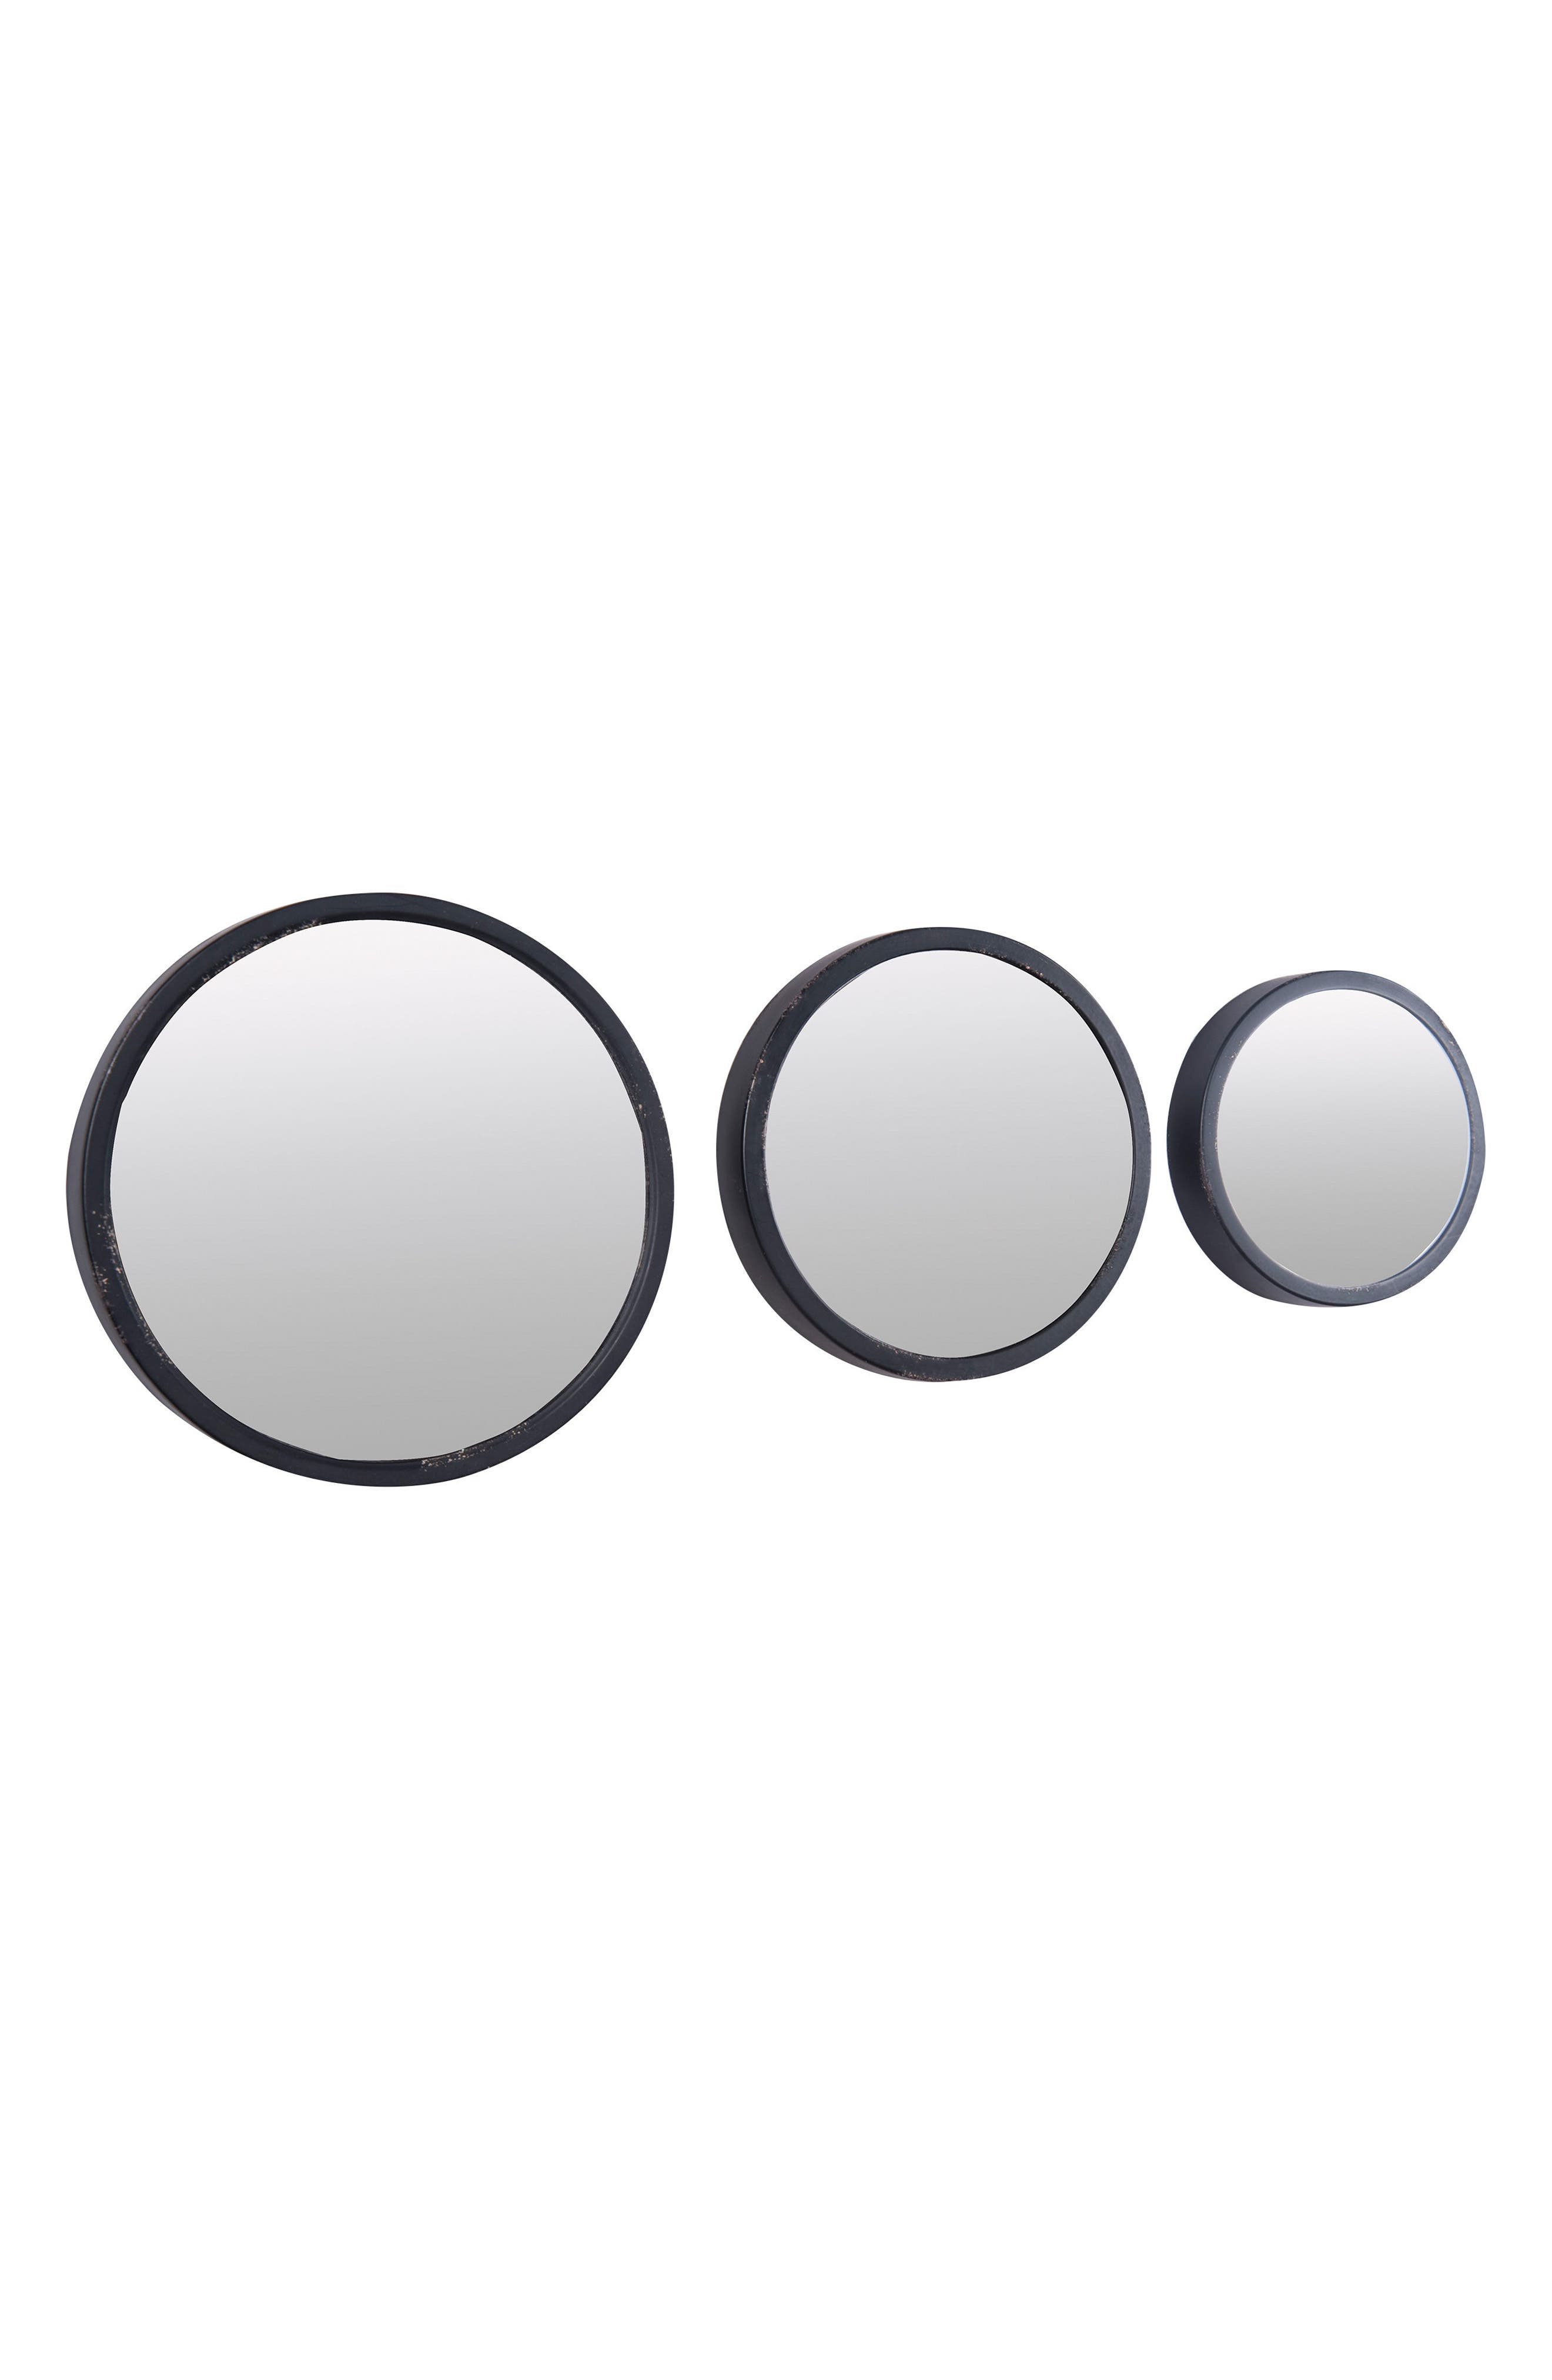 Set of 3 Round Mirrors,                             Main thumbnail 1, color,                             040